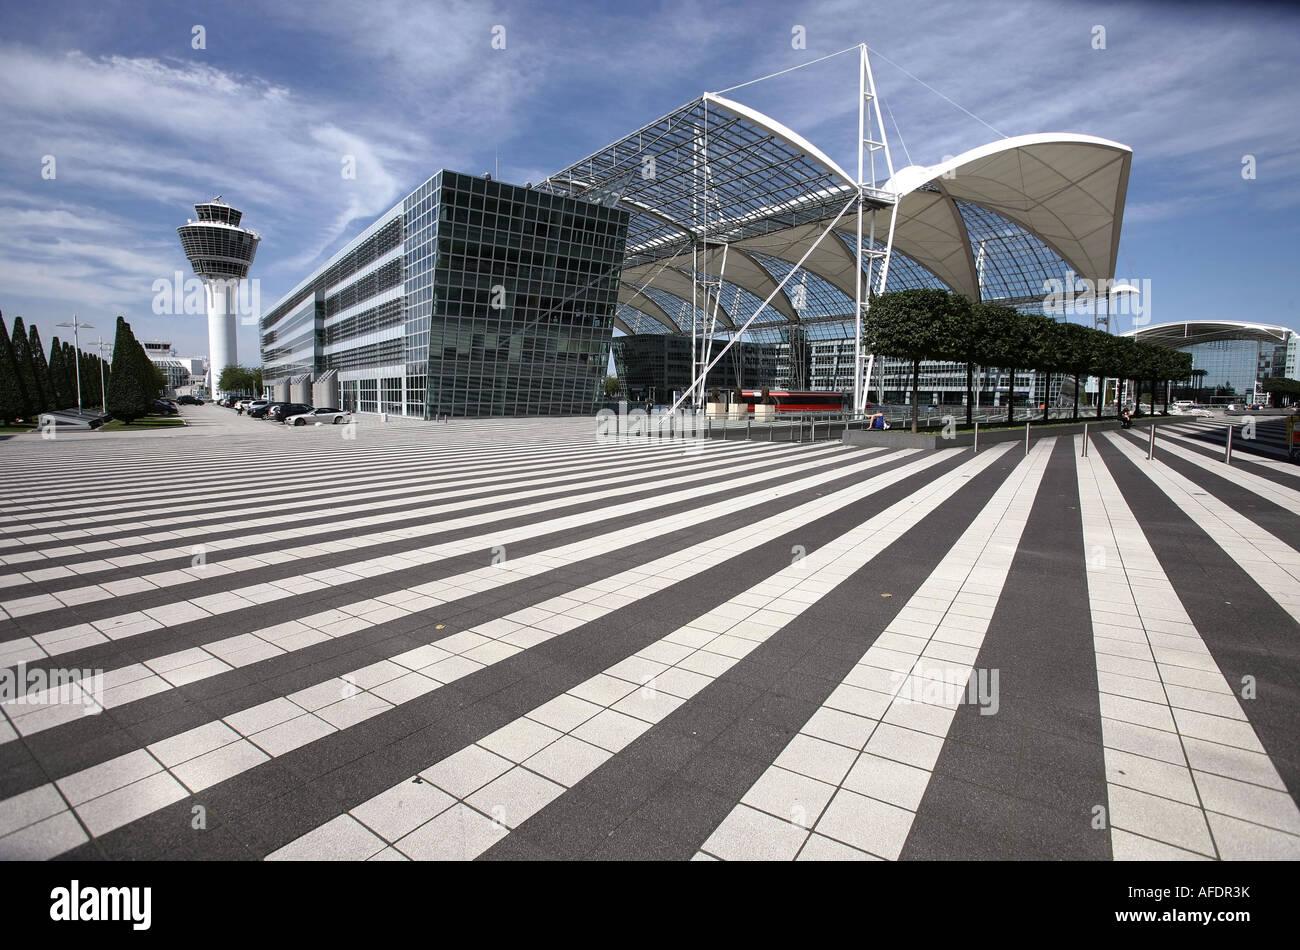 Illustration Airport: Terminal 1  crosswalk at Munich Airport - Stock Image